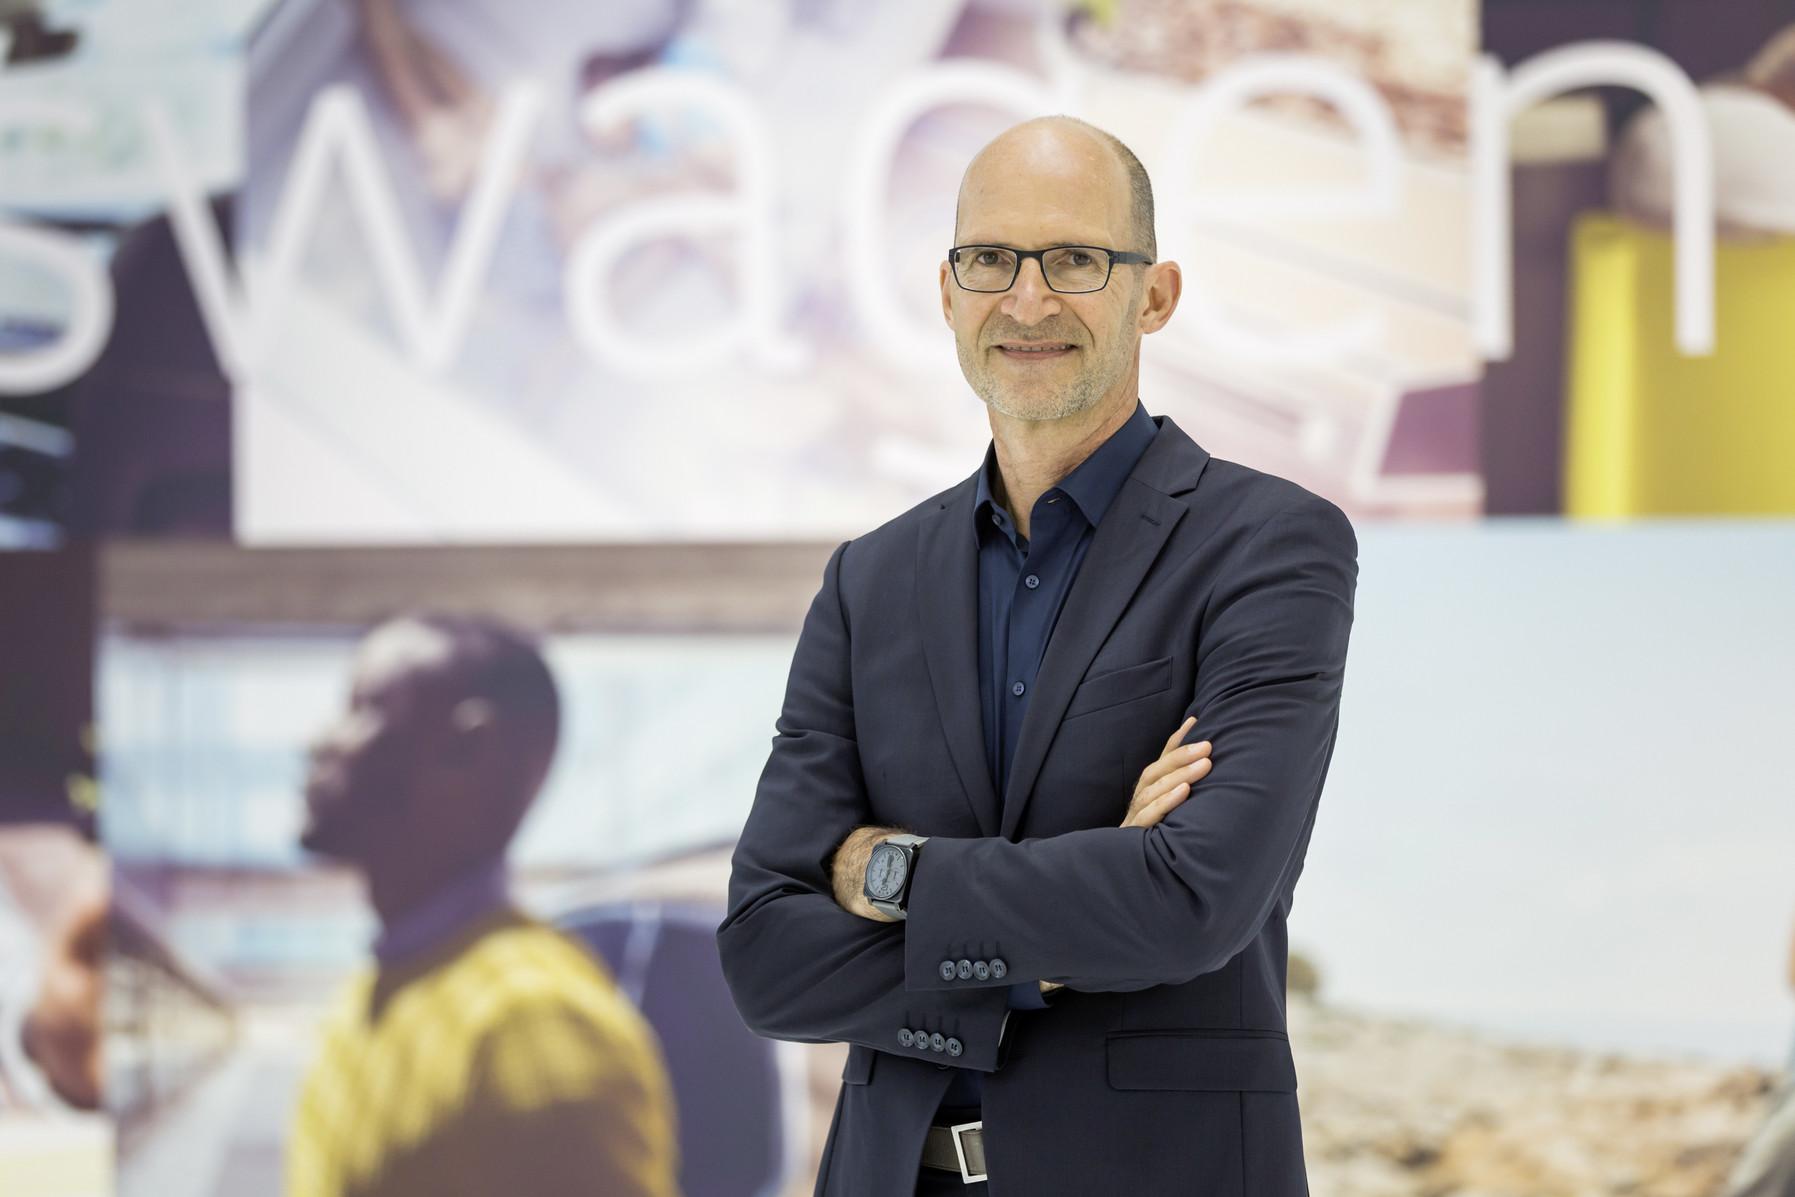 KLAUS BISCHOFF NEW HEAD OF VW GROUP DESIGN